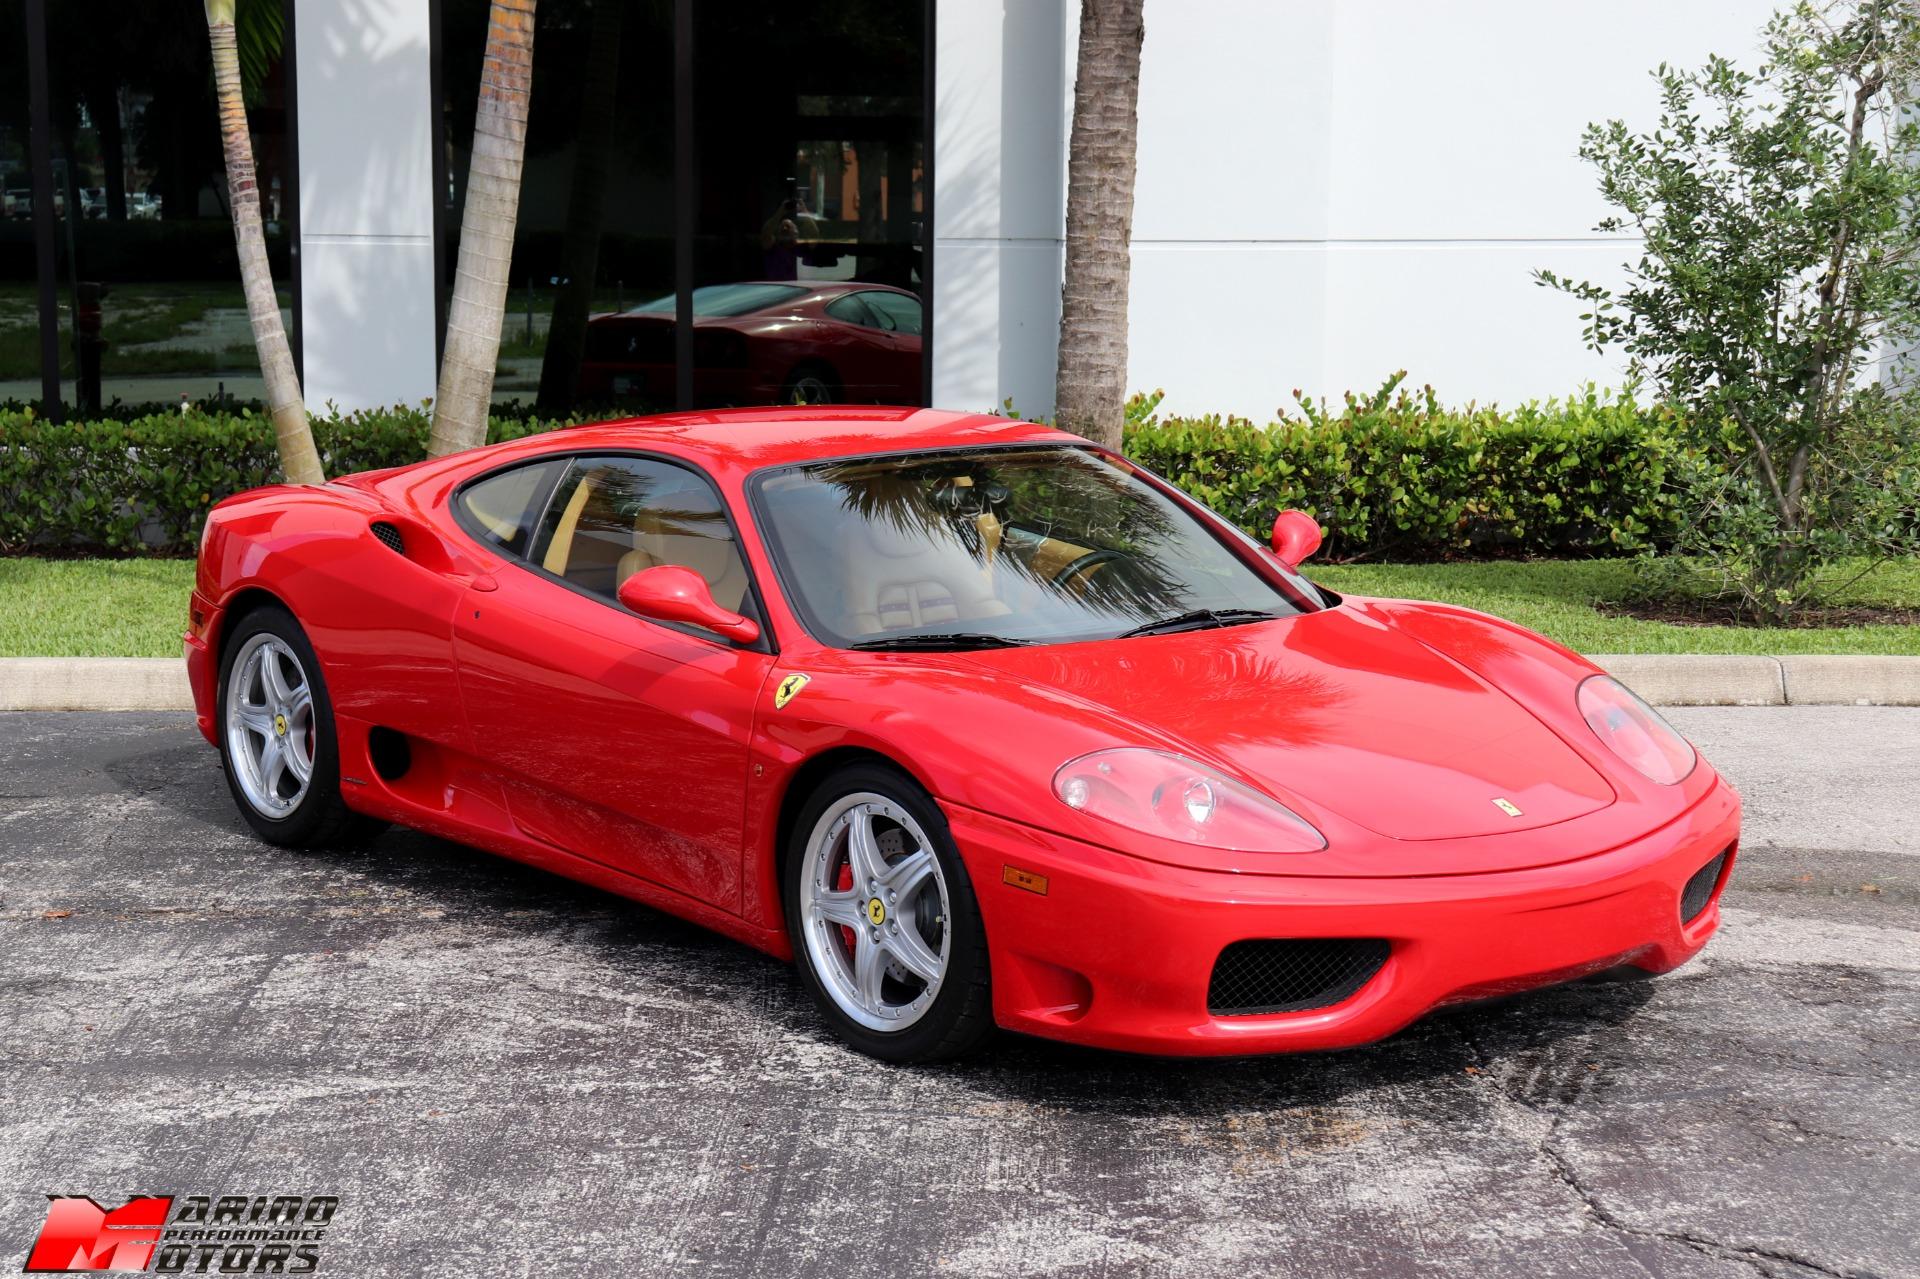 Used-2002-Ferrari-360-Modena